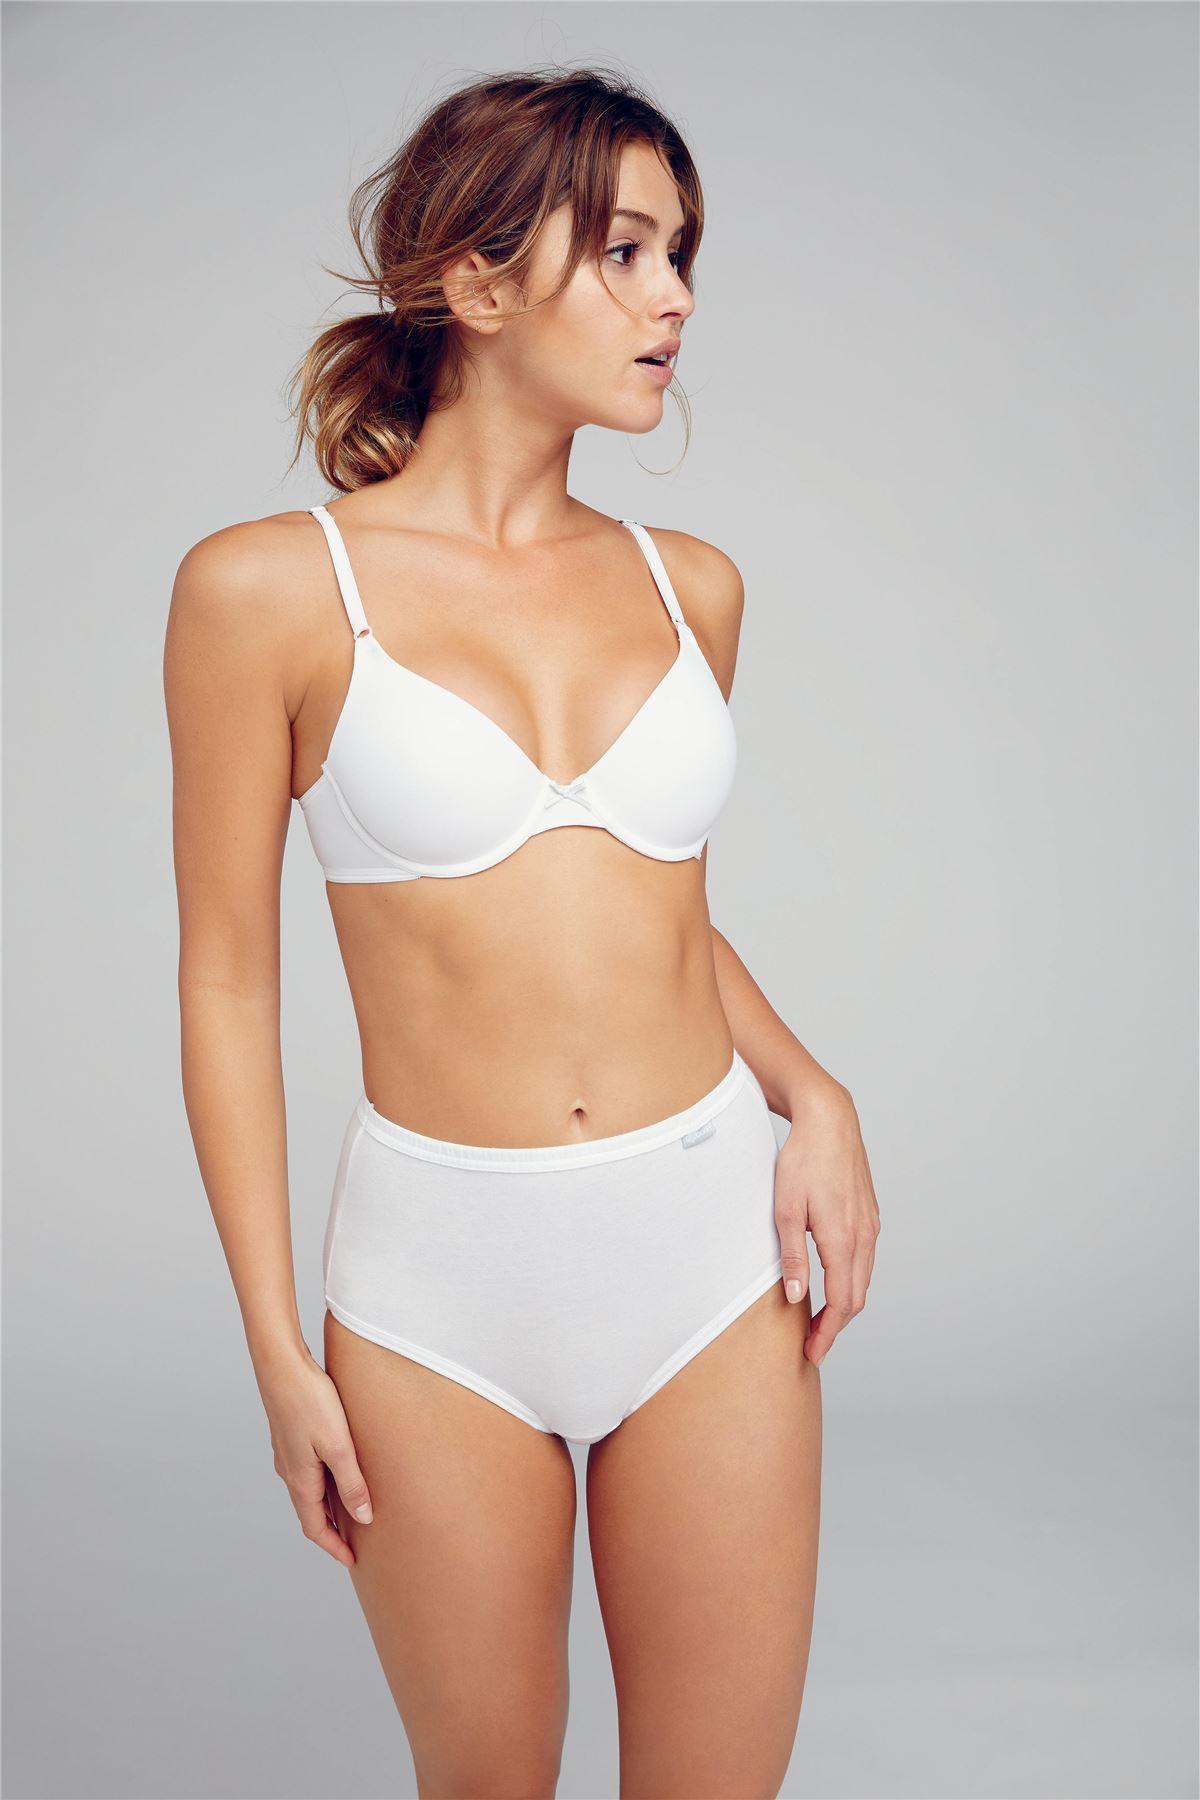 Jockey Women/'s Underwear Elance 100/% Cotton Maxi Brief 3 Pack Various Colours